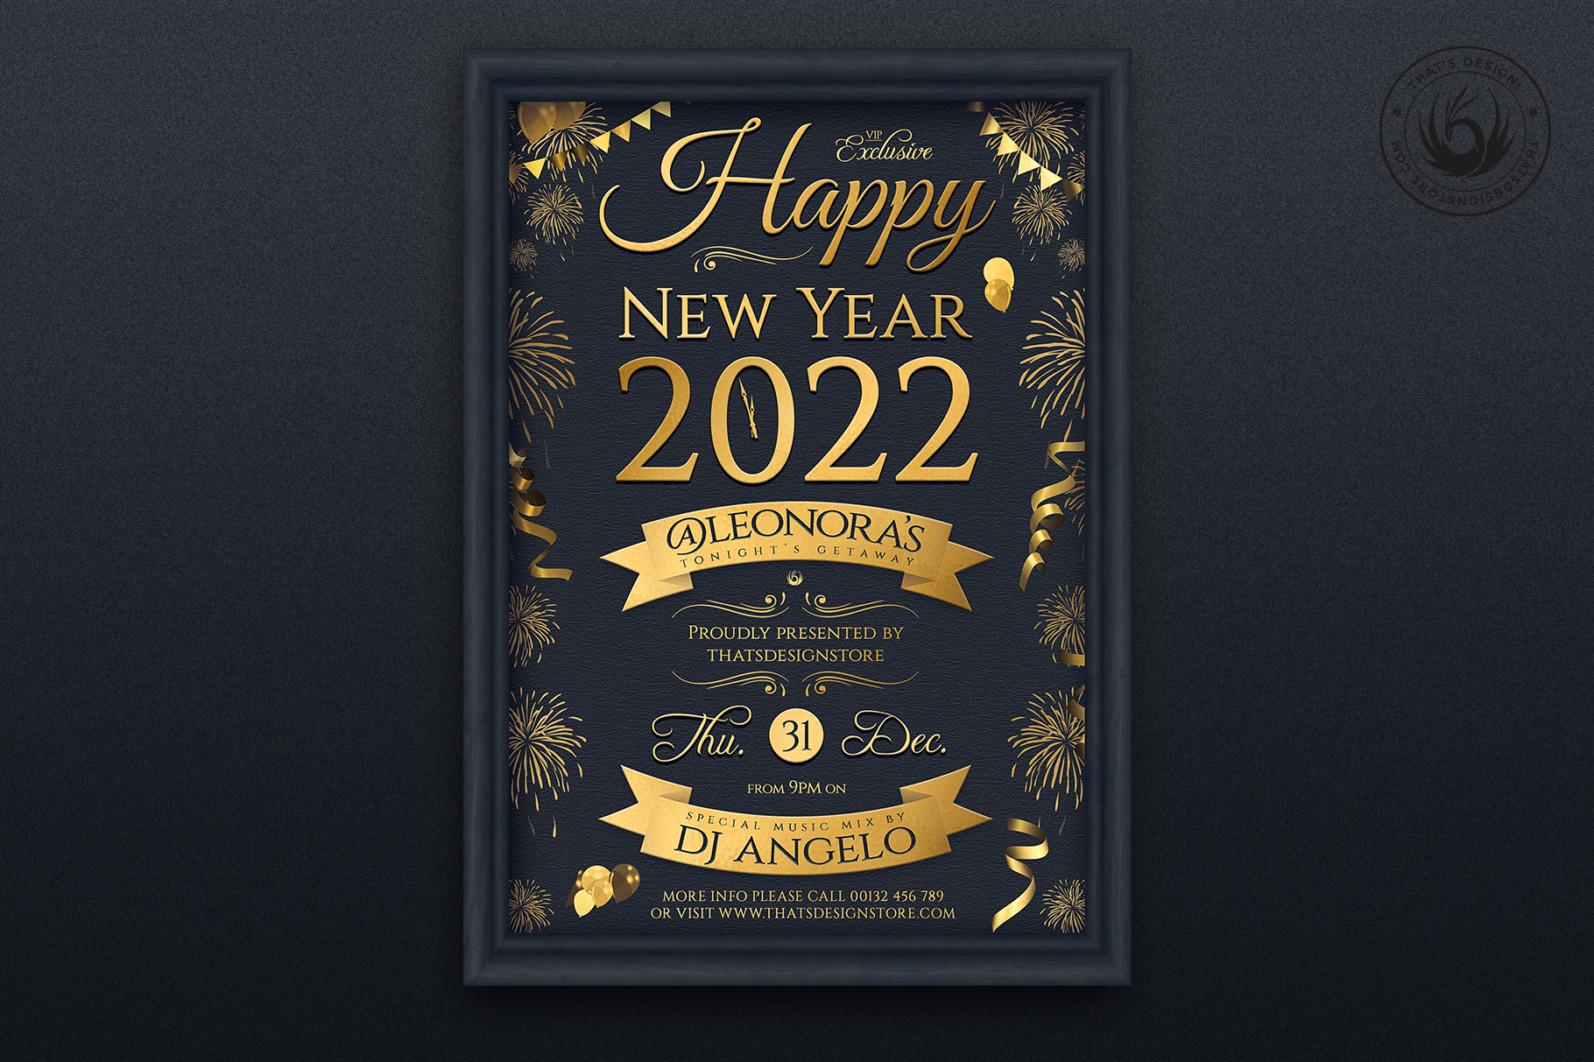 New Year Flyer Template V5 - 07 New Year Flyer Template V5 -